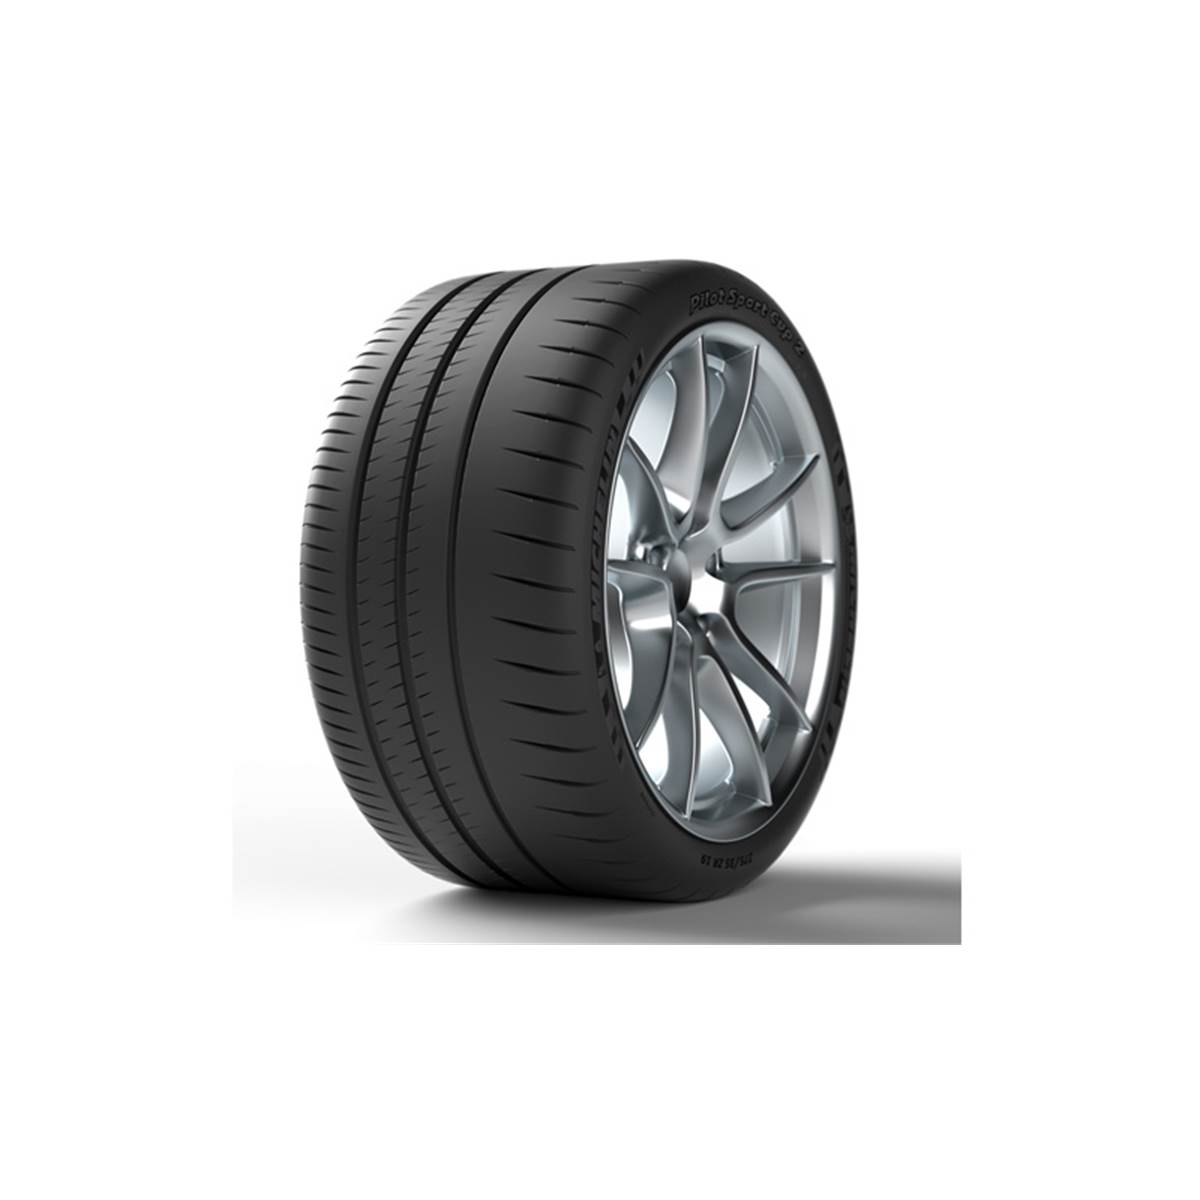 Pneu Michelin 225/40R18 92Y Pilot Sport Cup 2 XL